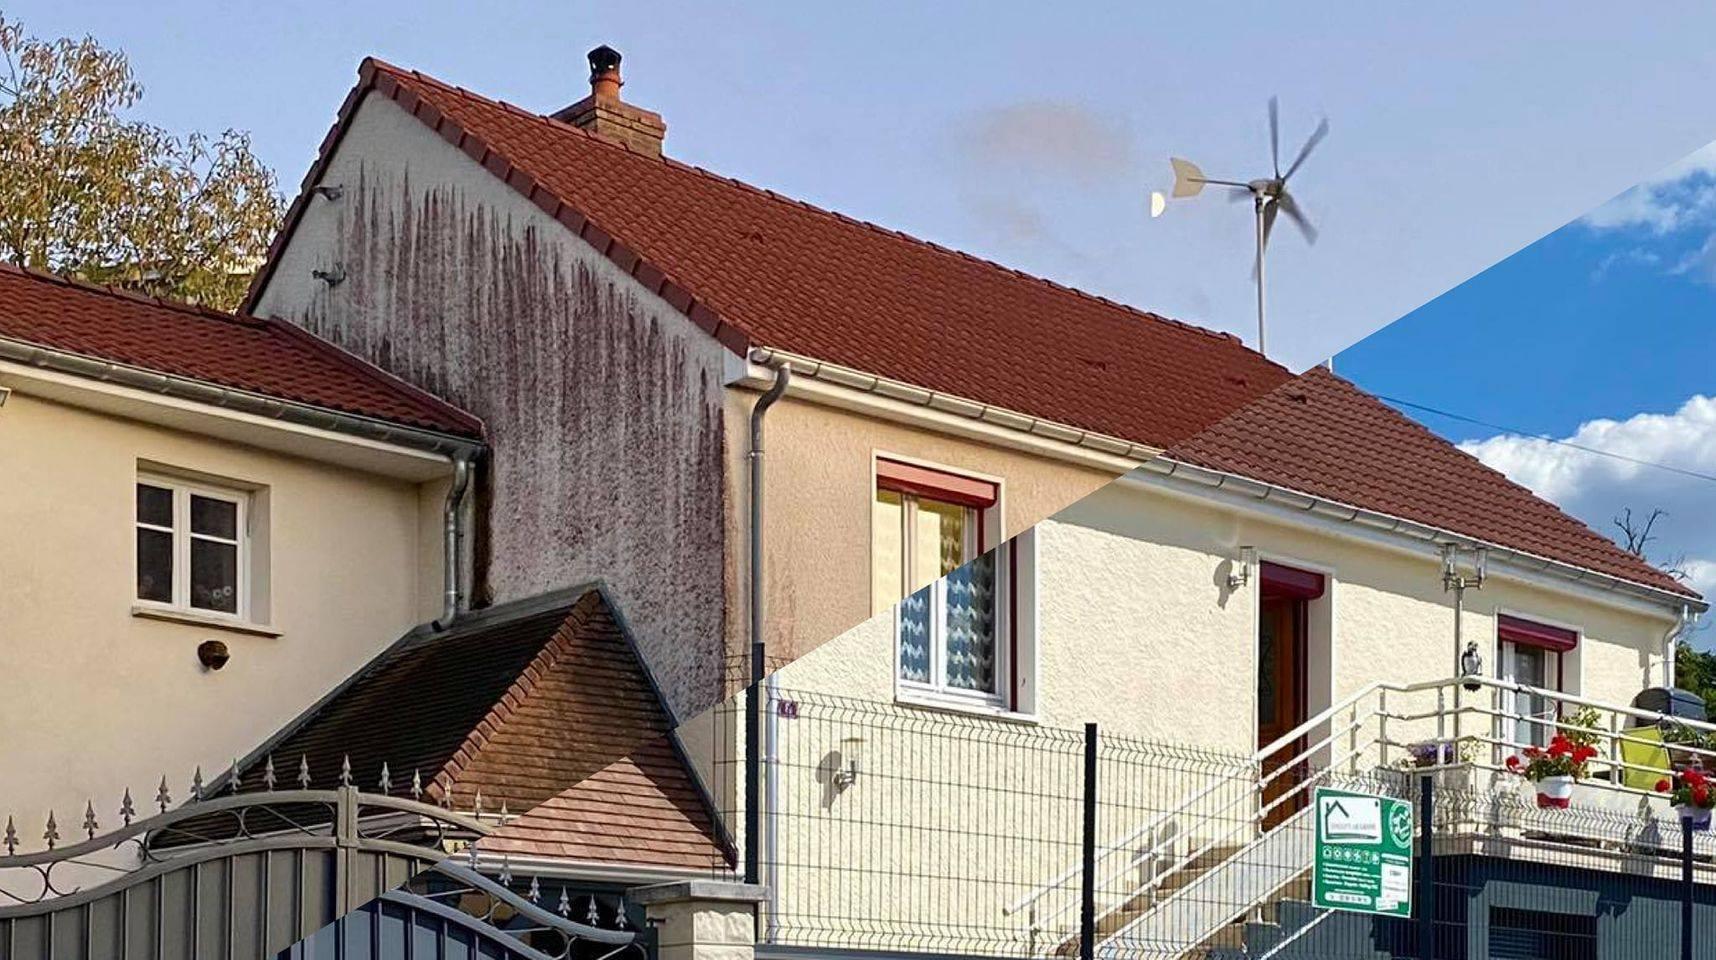 01 Traitement-anti-algues-embellissement-facade